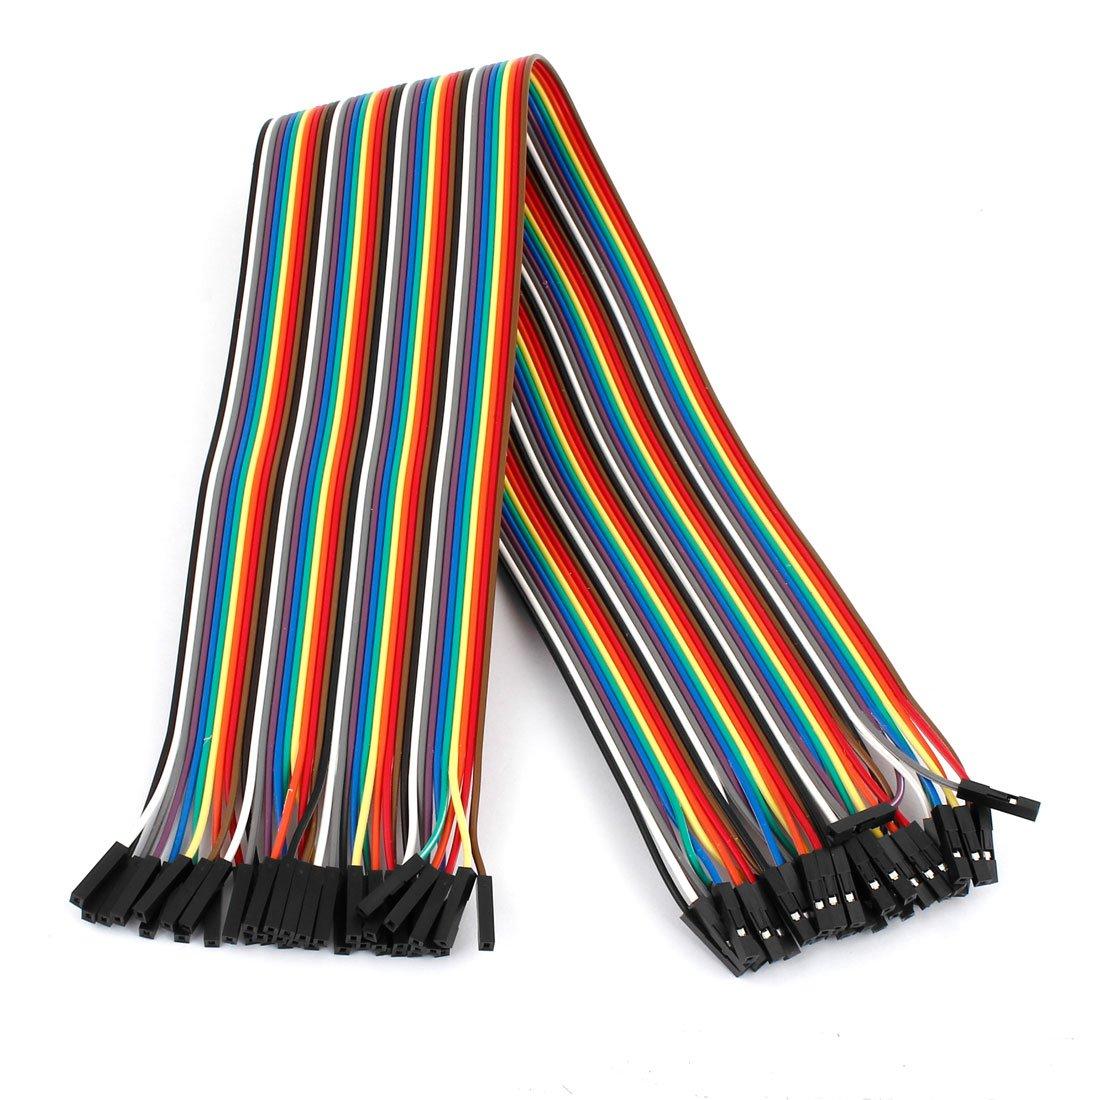 40cm 2.54mm F//F 40 Pin Solderless Colored Breadboard Jumper Wire